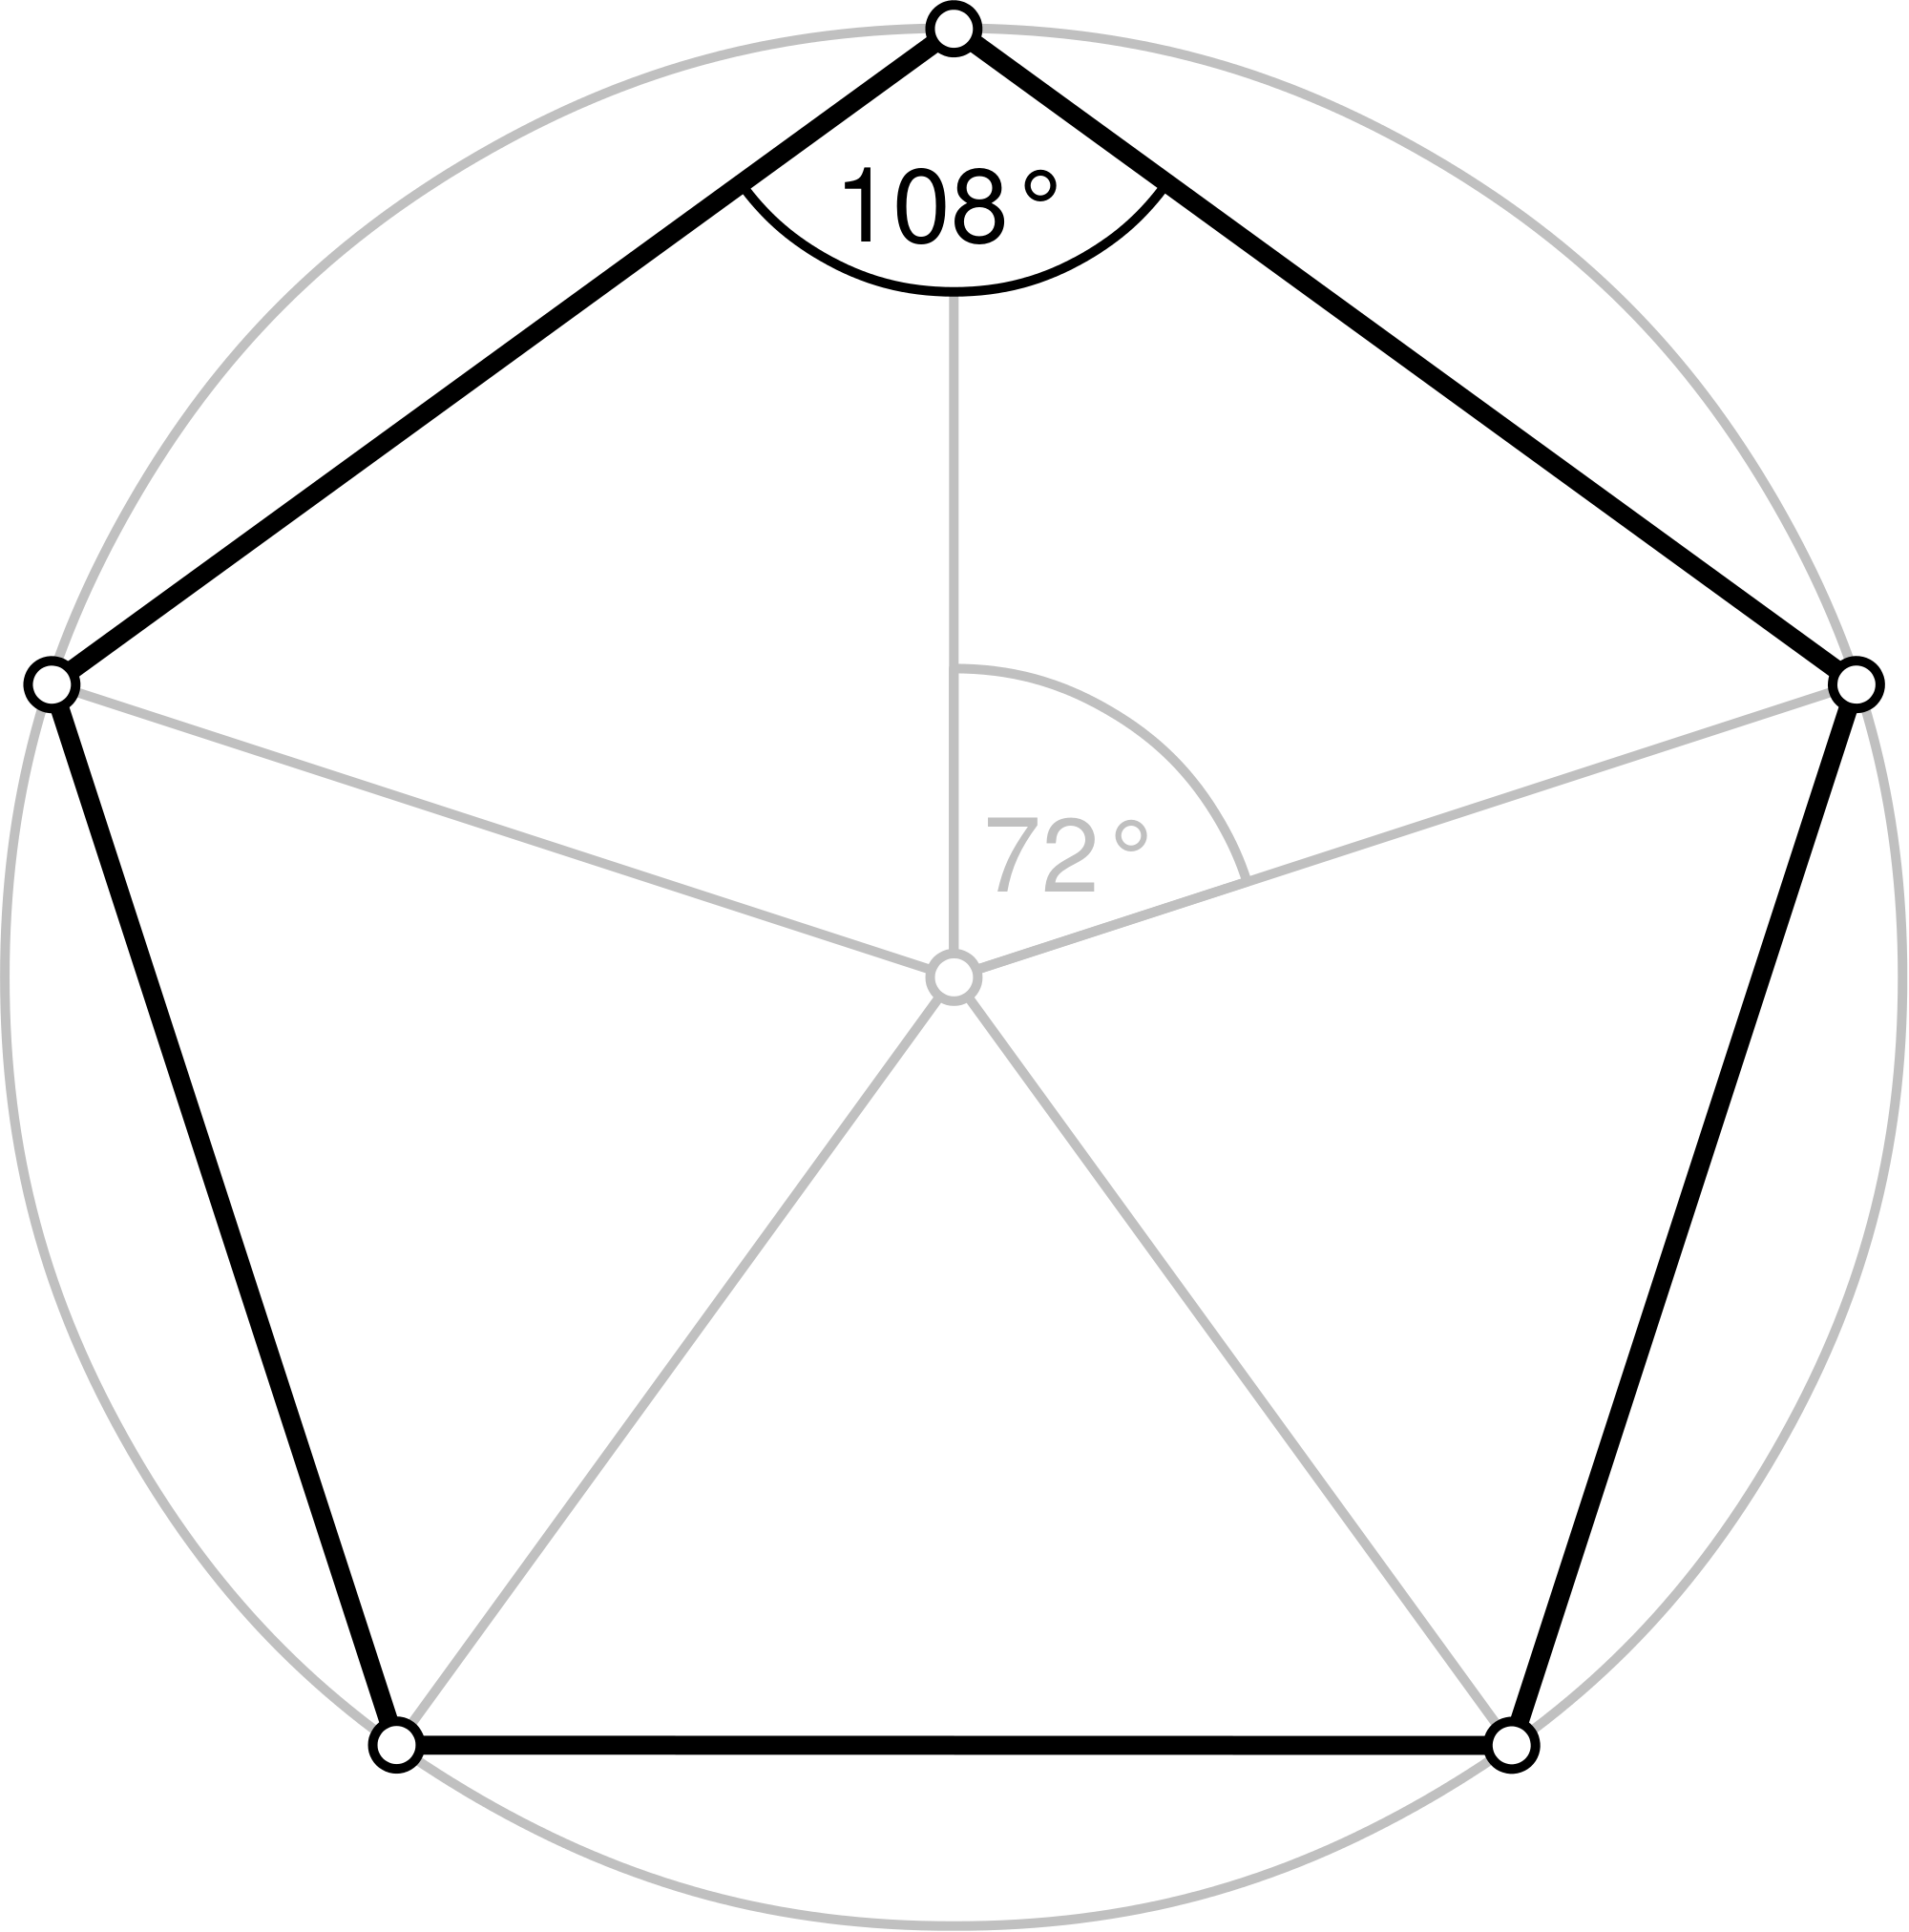 Pentagram With 72 Degree Segments Manual Guide